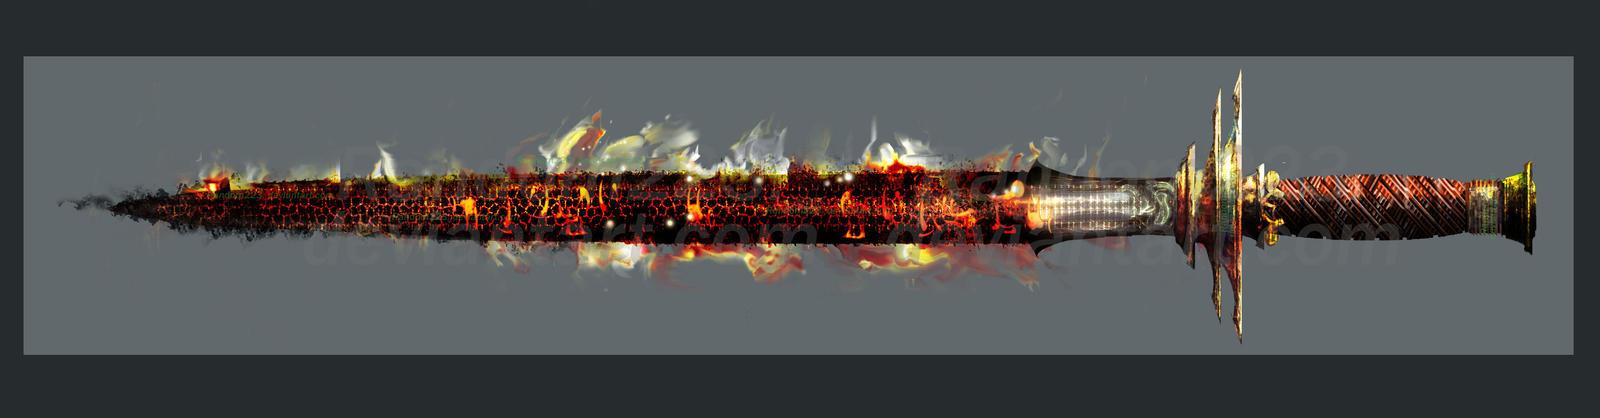 Weaponry 259 by Random223